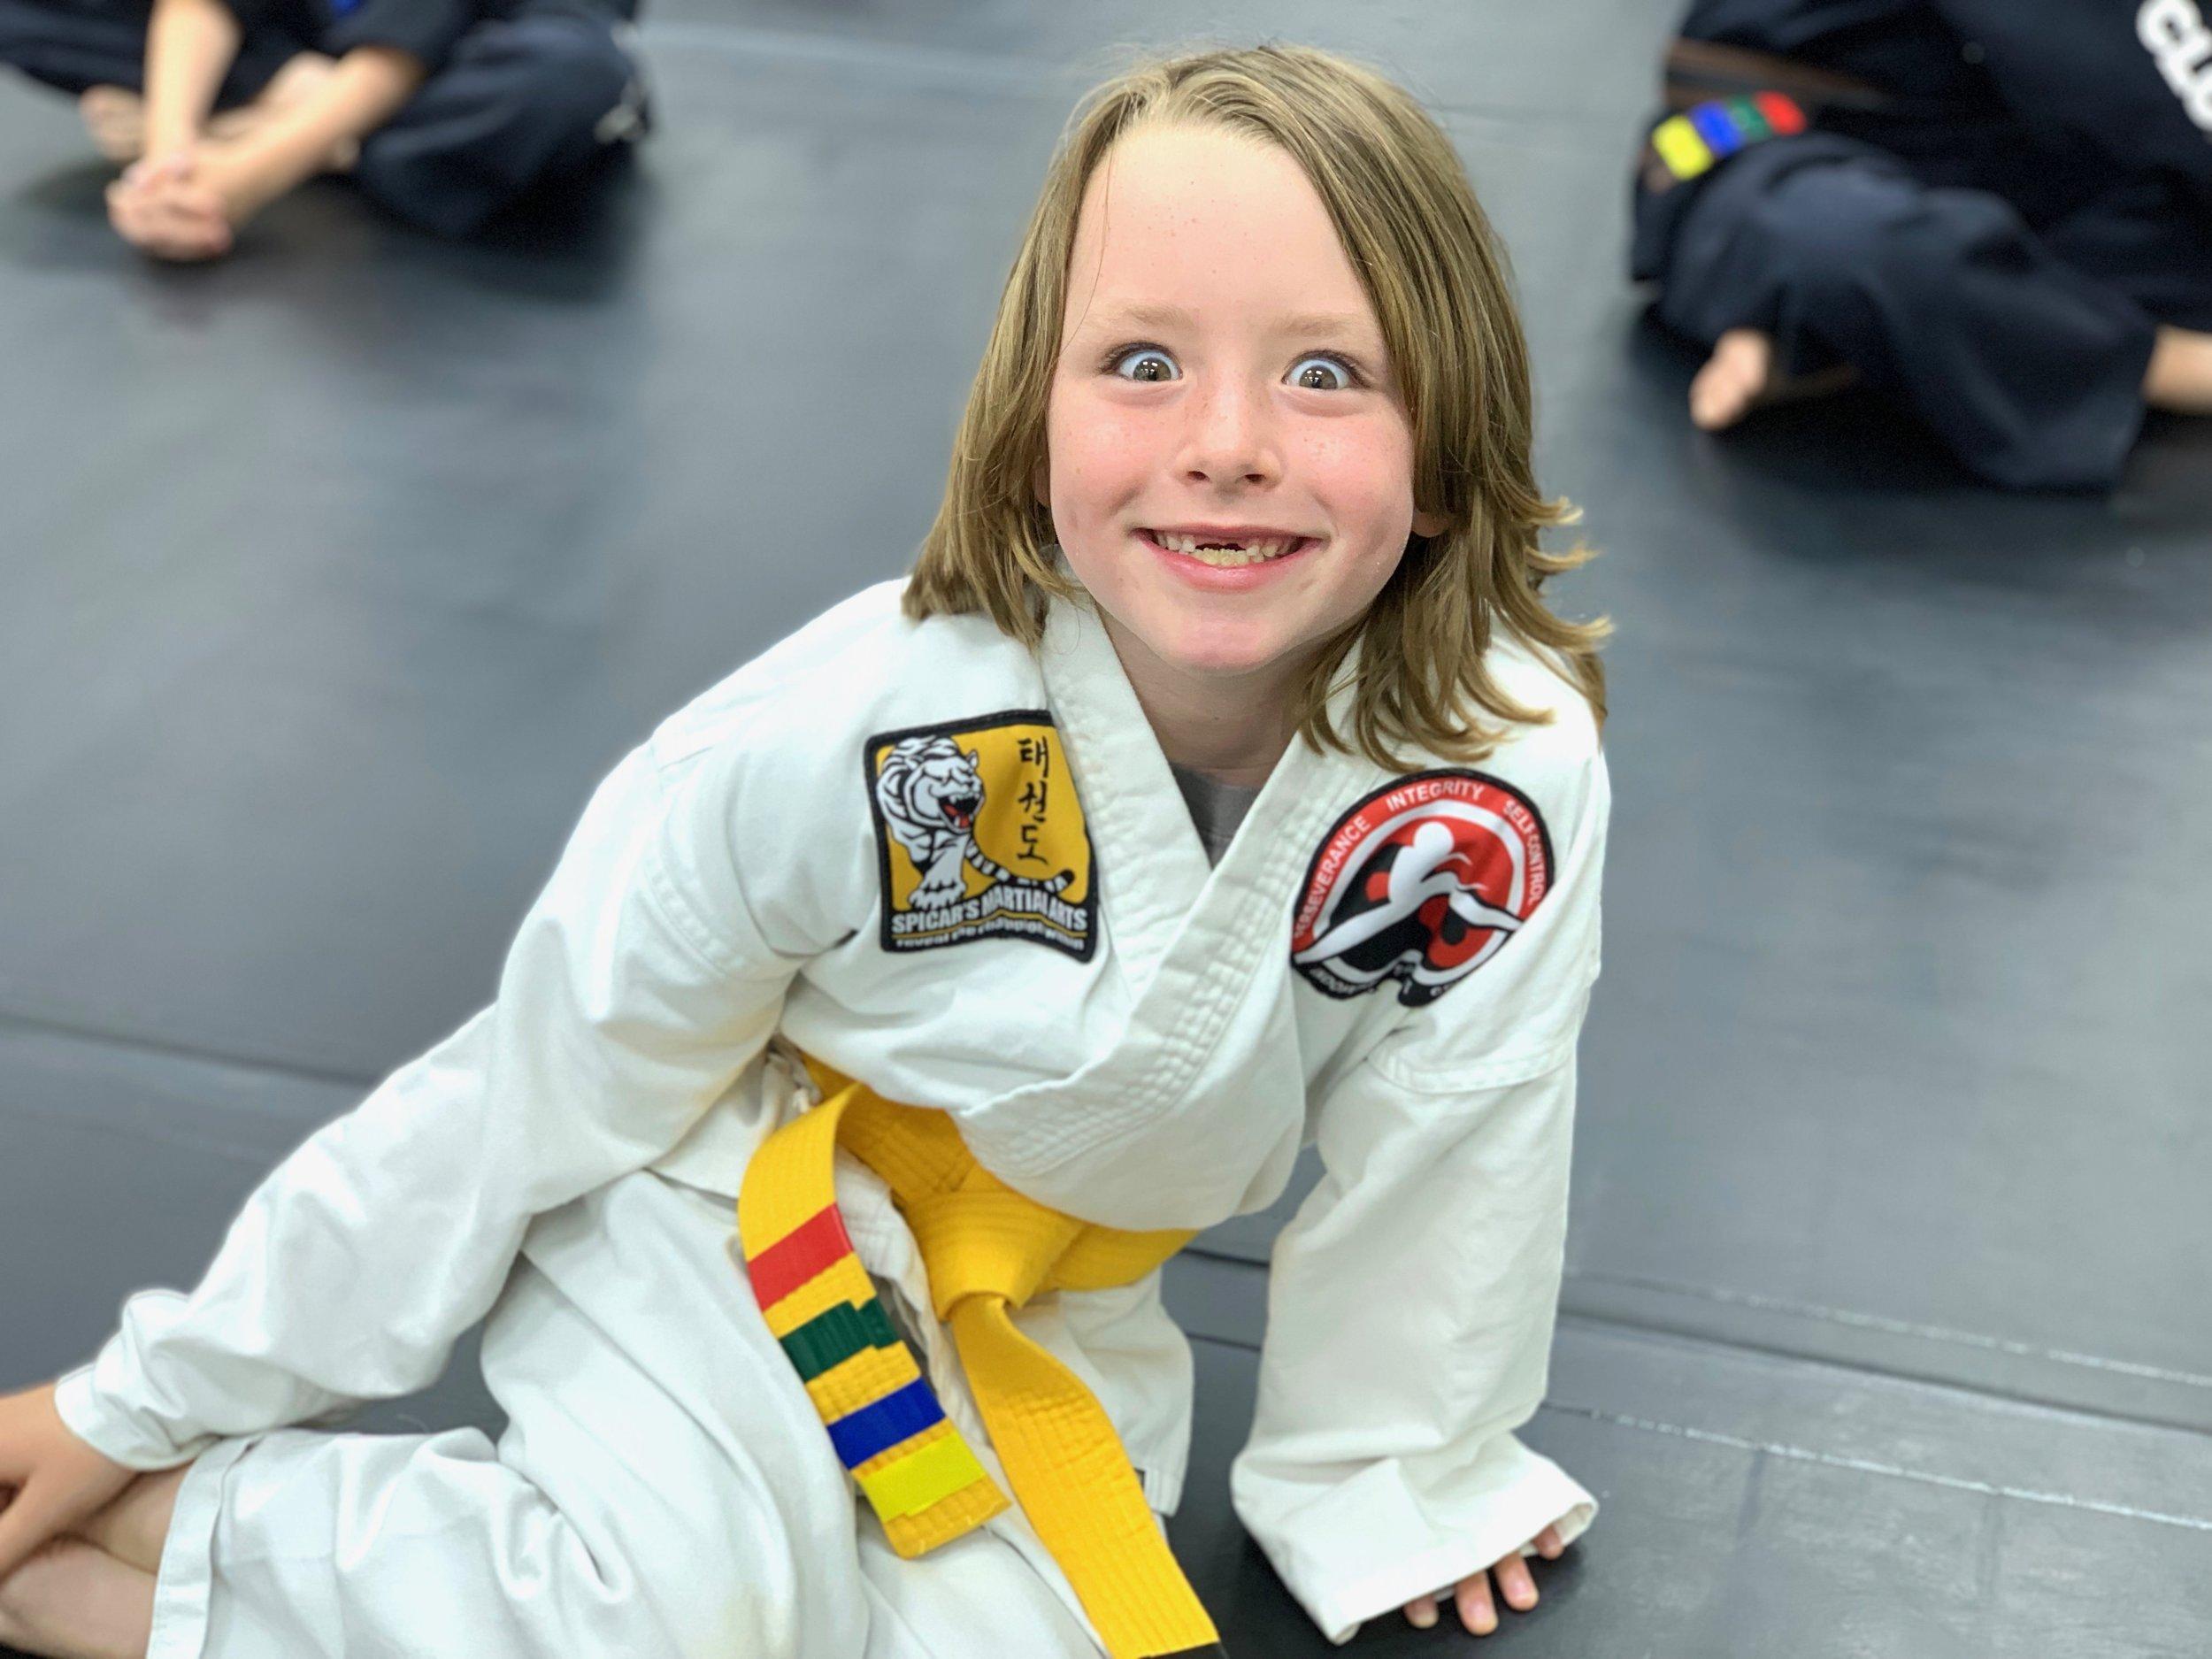 karate-kids-program-souhtlake-keller-grapevine-texas00050.jpeg